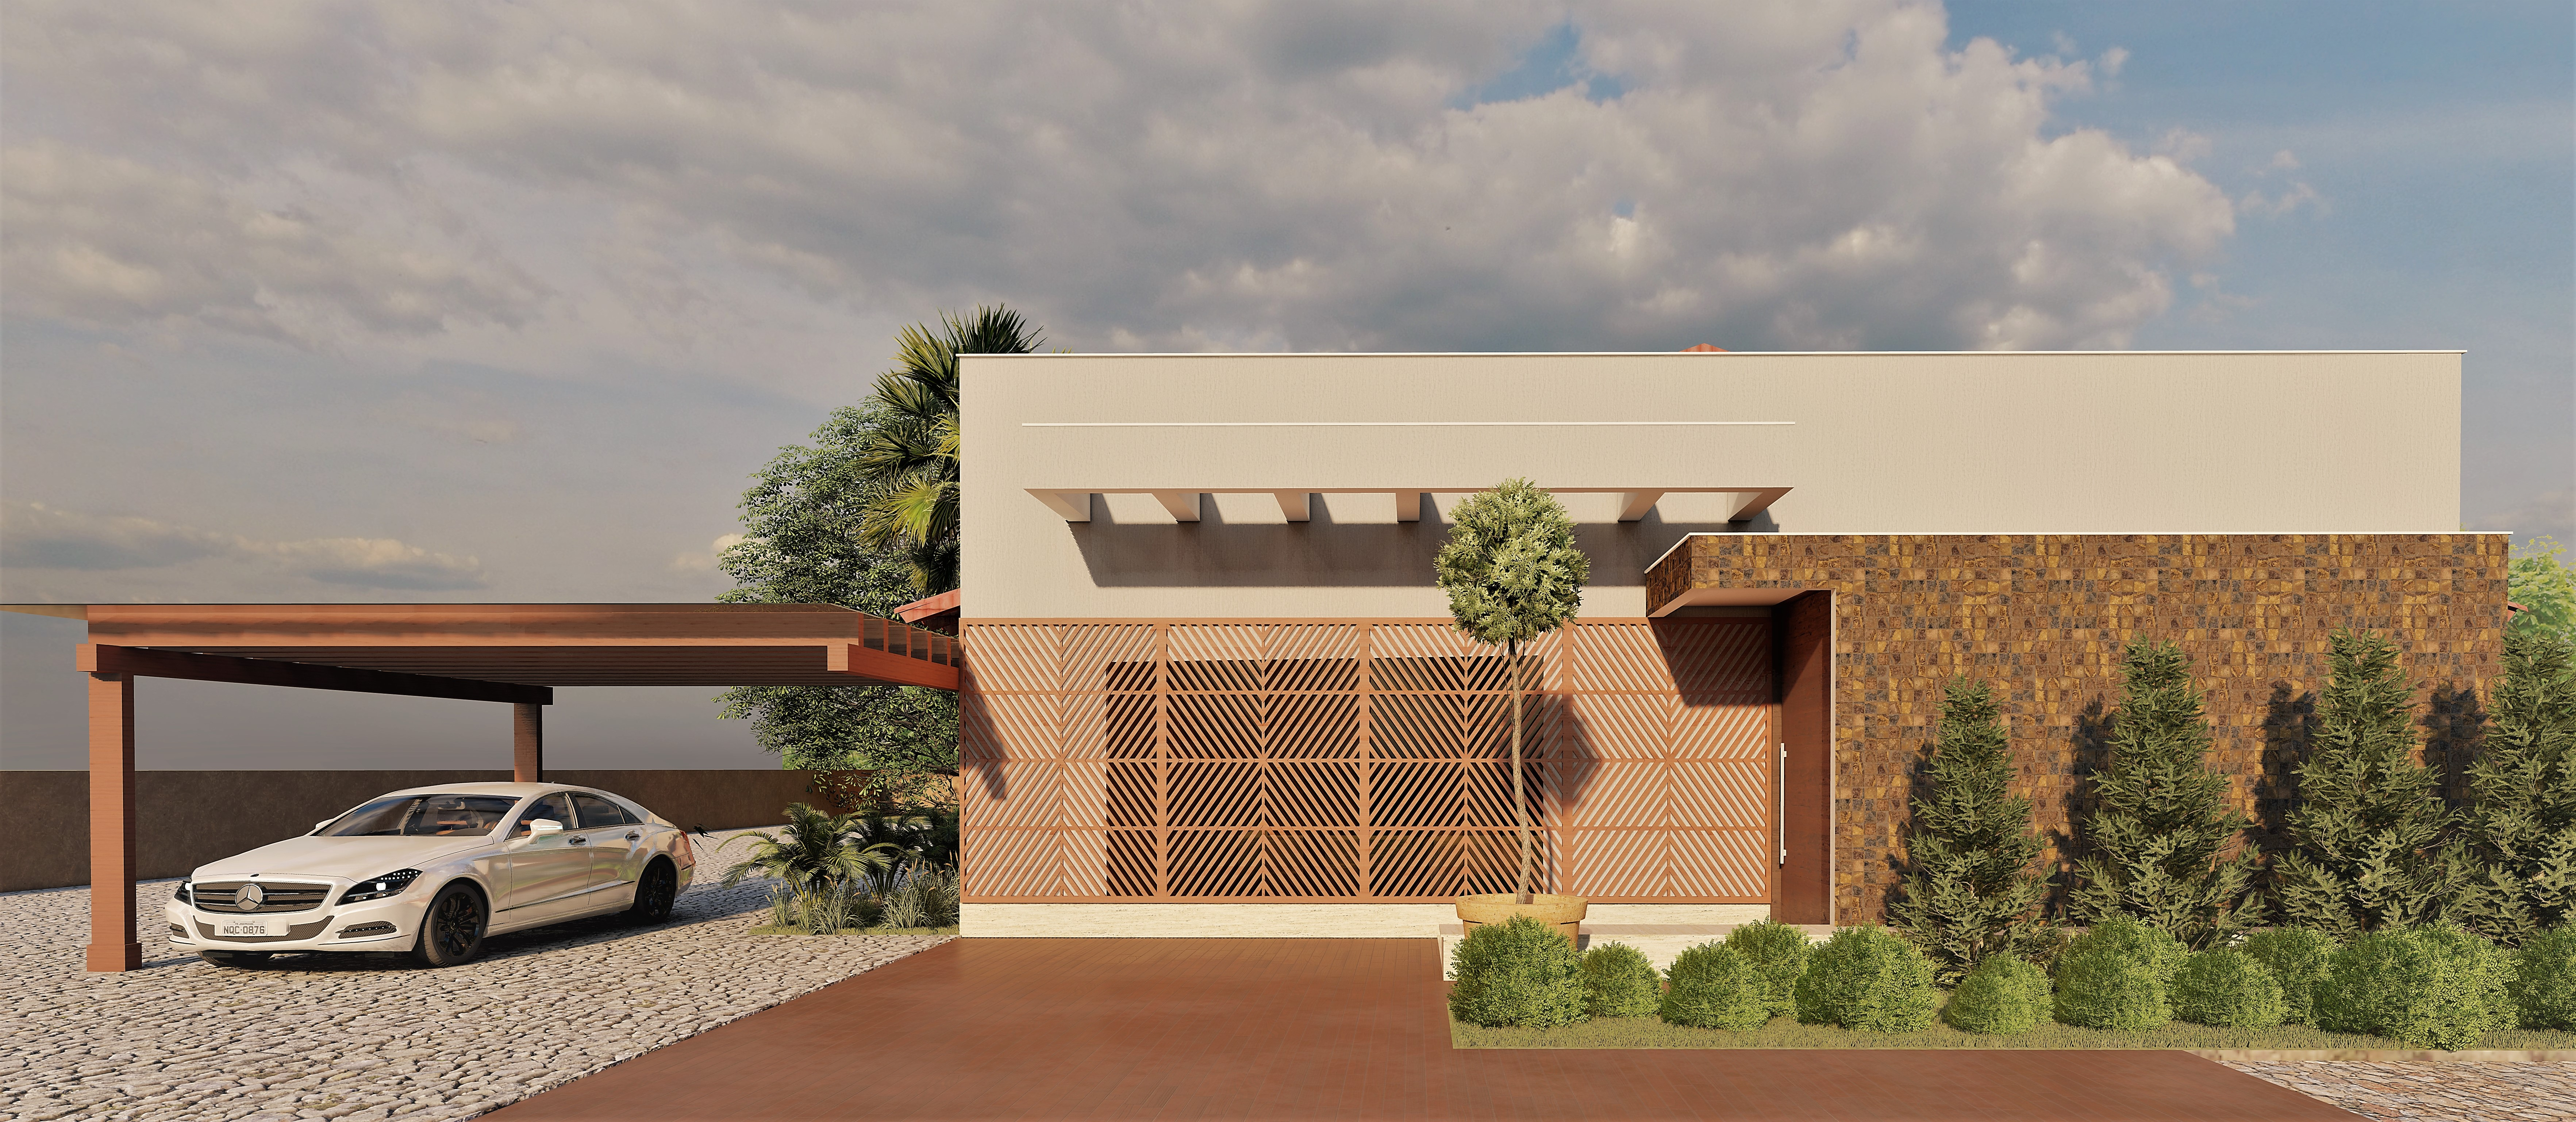 Projeto de Arquitetura - Park Way - DF